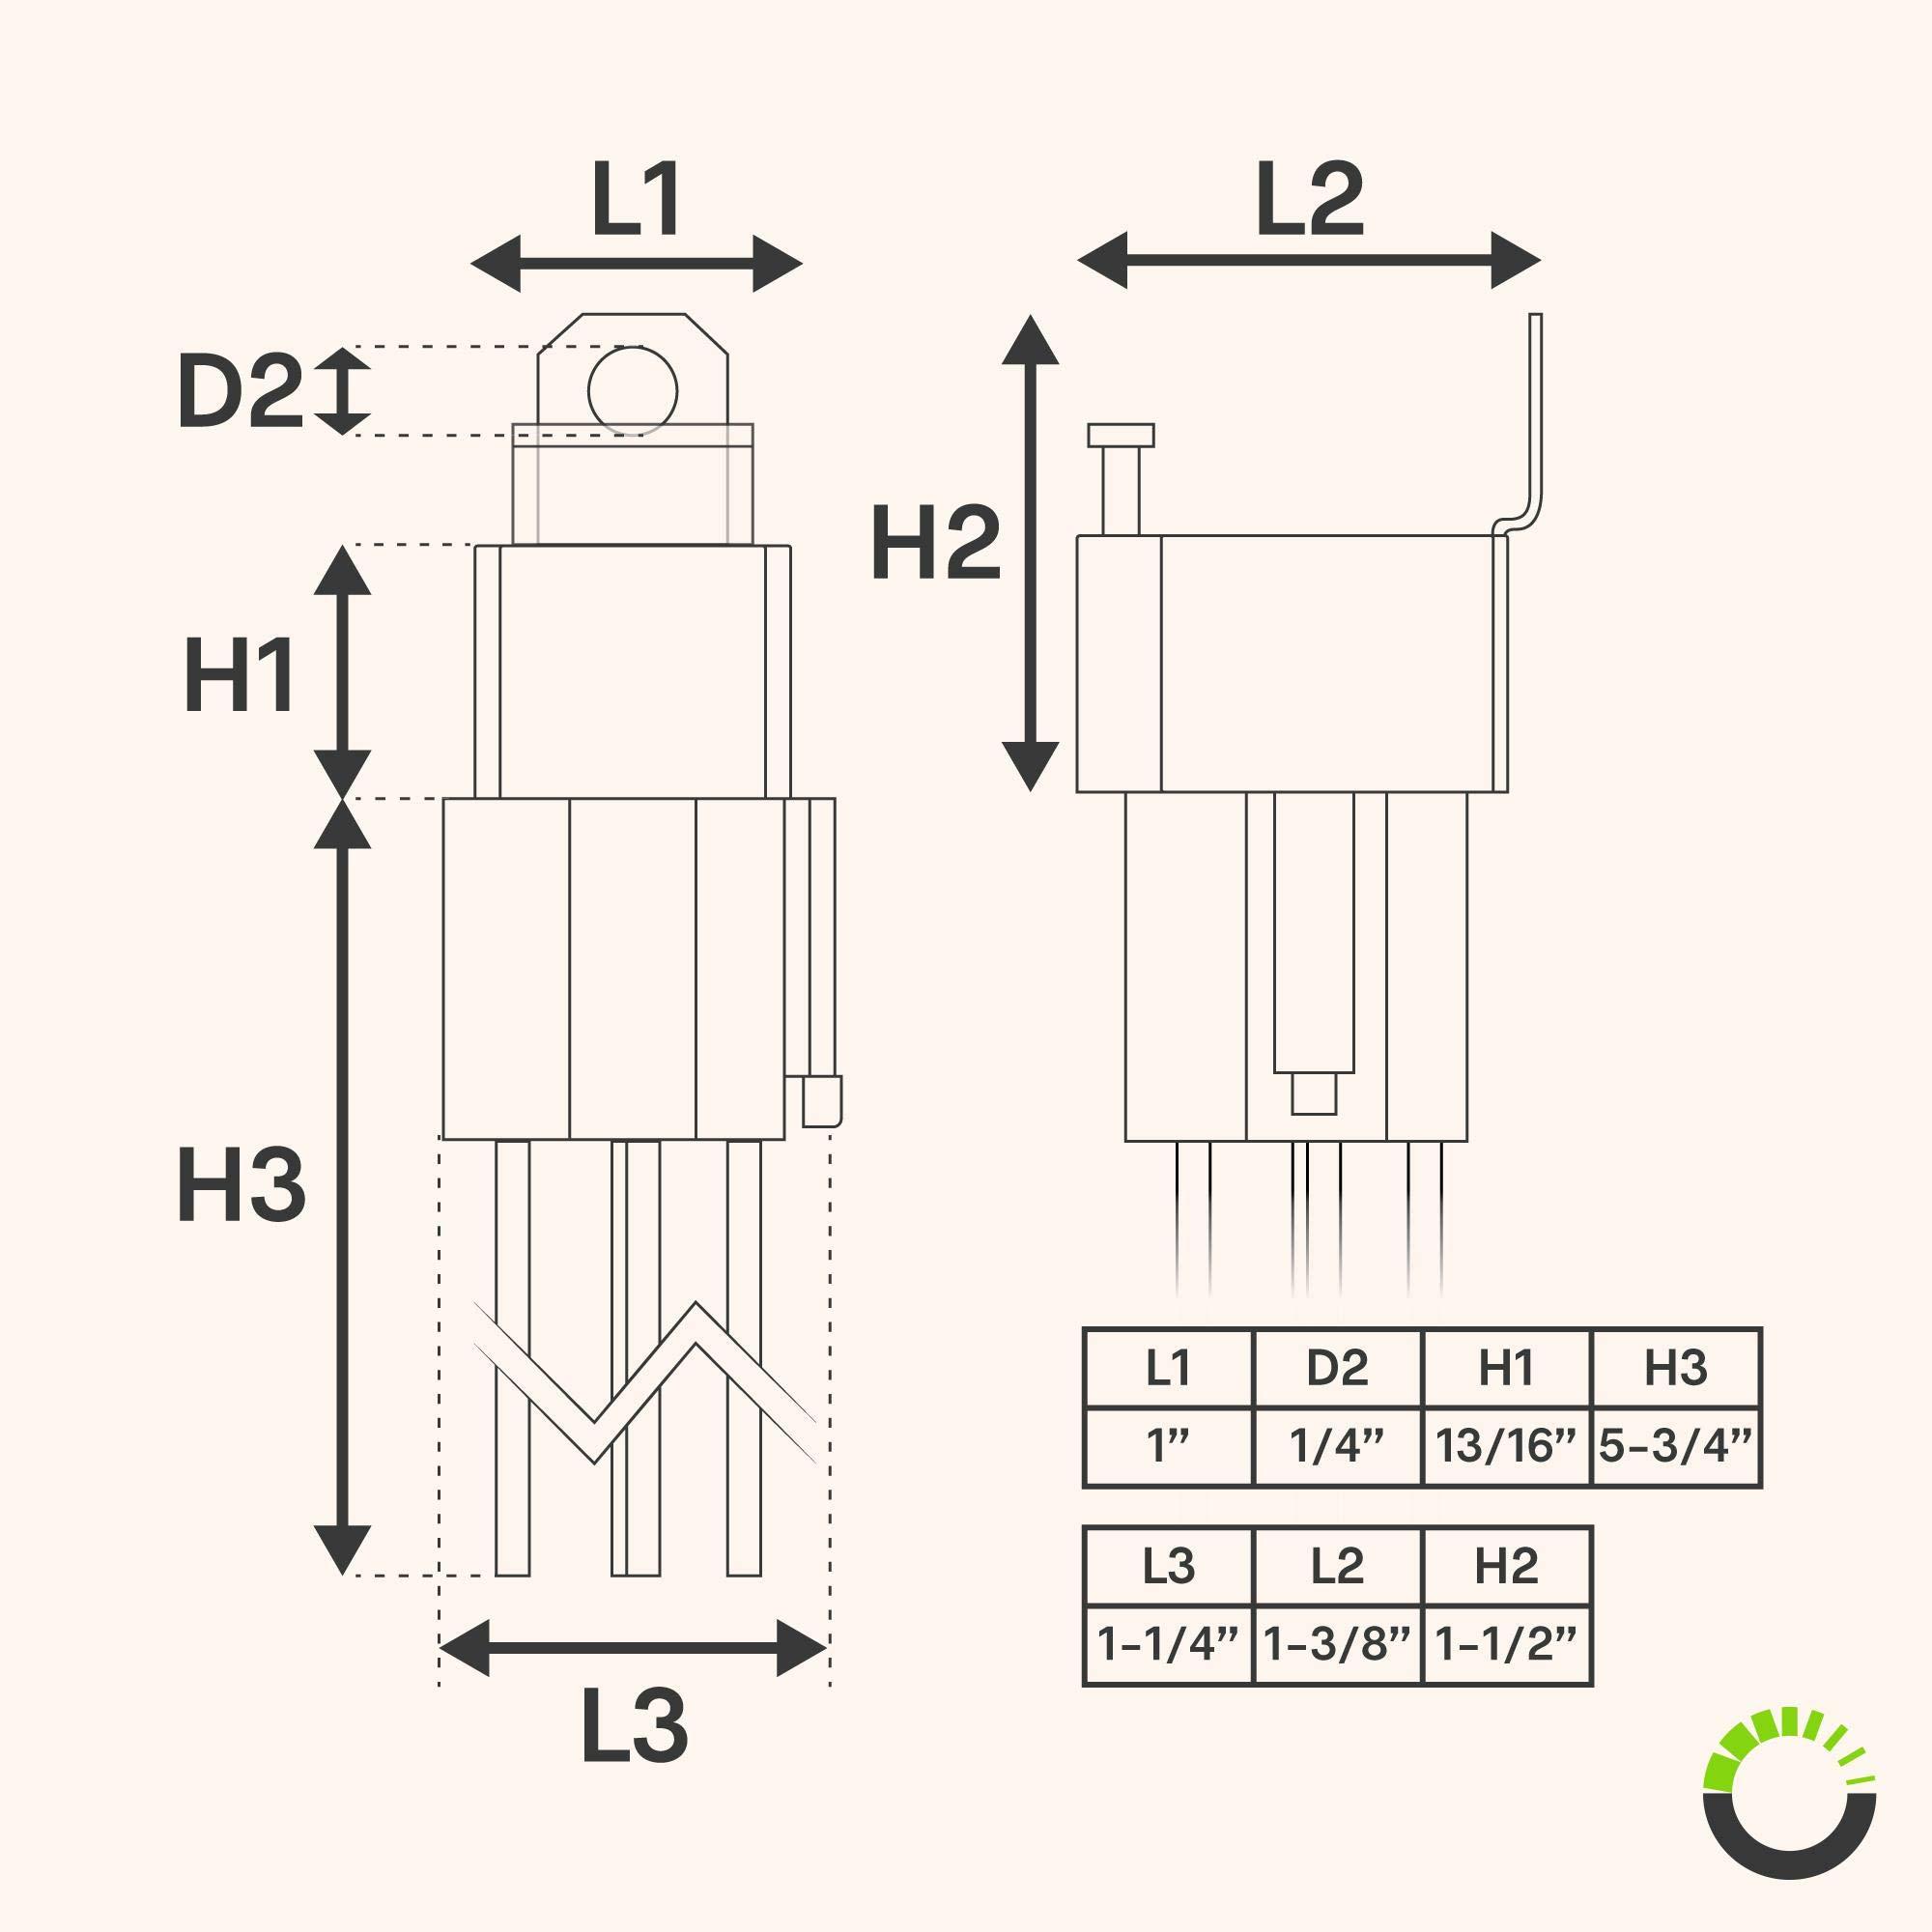 Pin Automotive Relay Diagram On 4 Pin 12v Relay Wiring Diagram